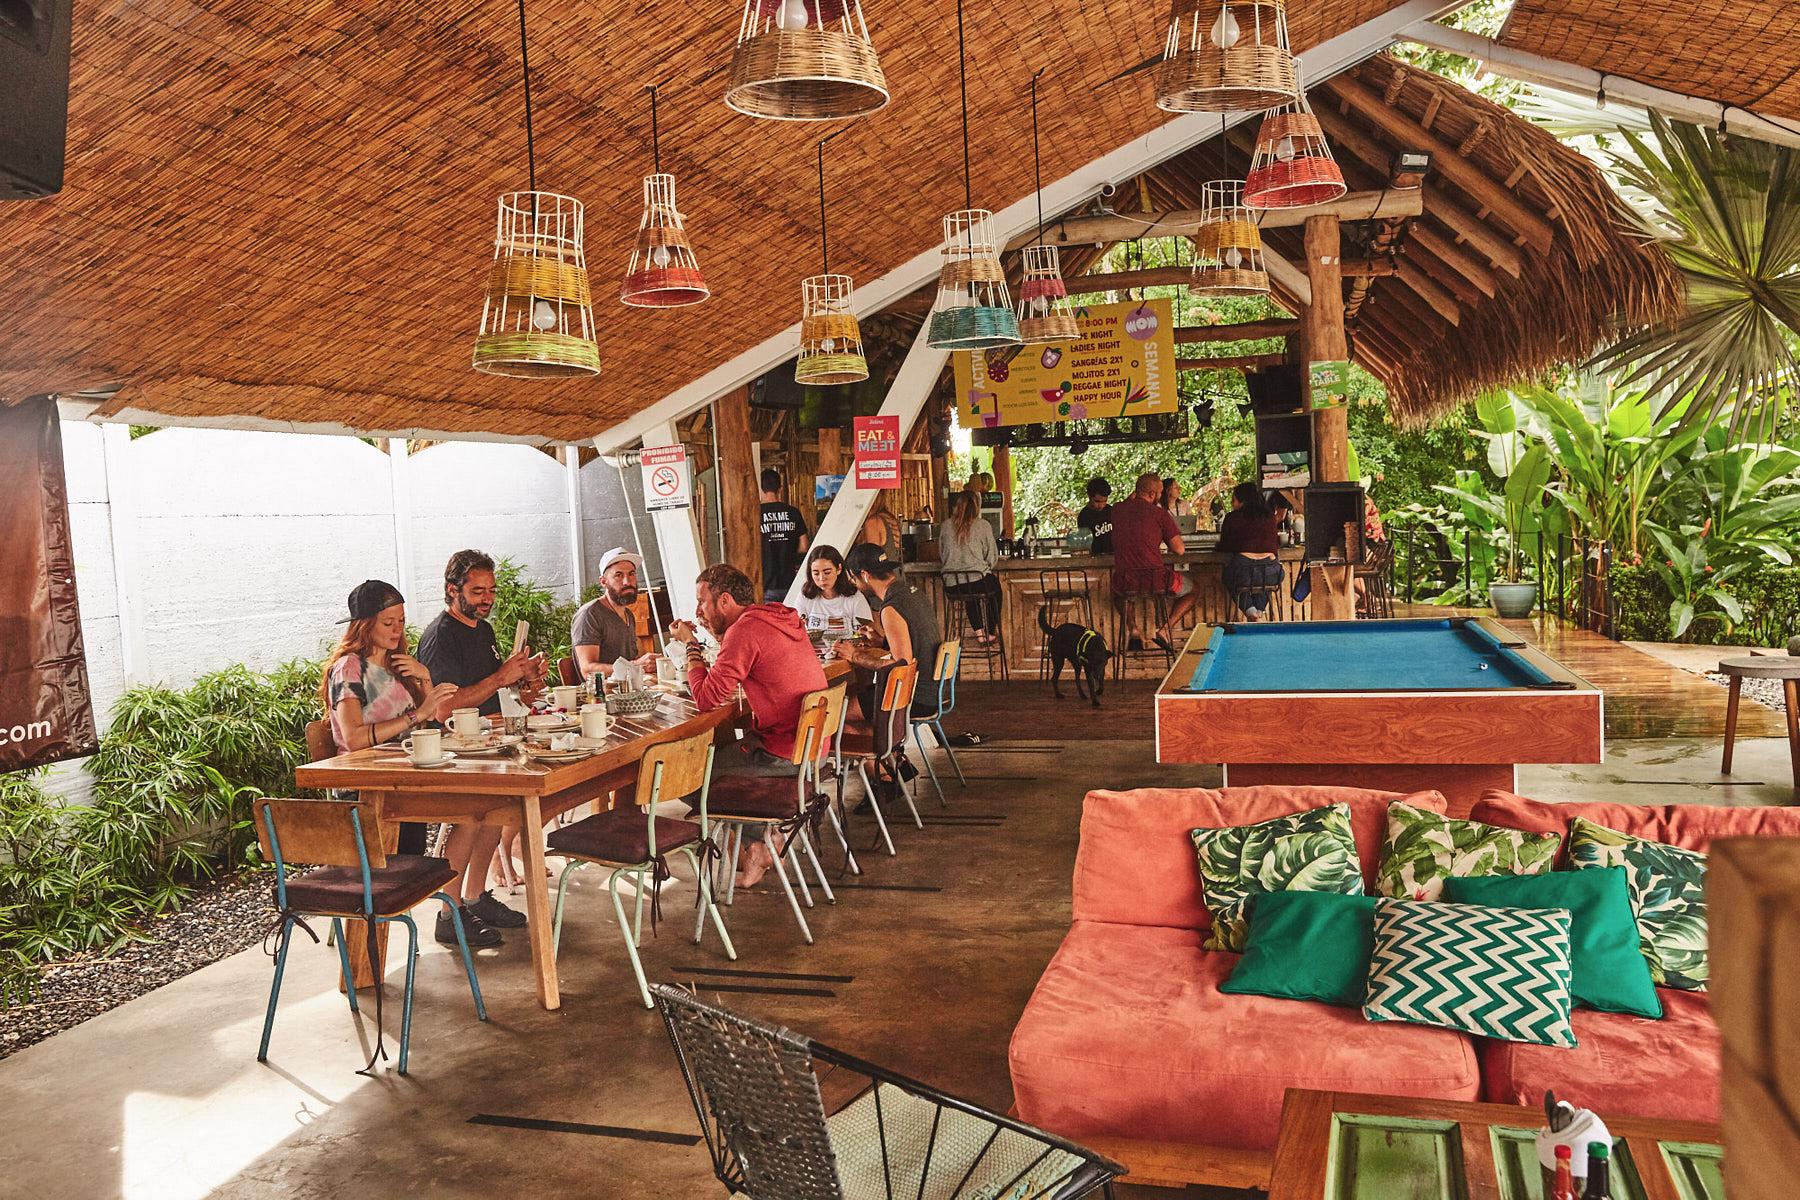 Stephi-Wald-photography-miami-travel-hospitality- 49